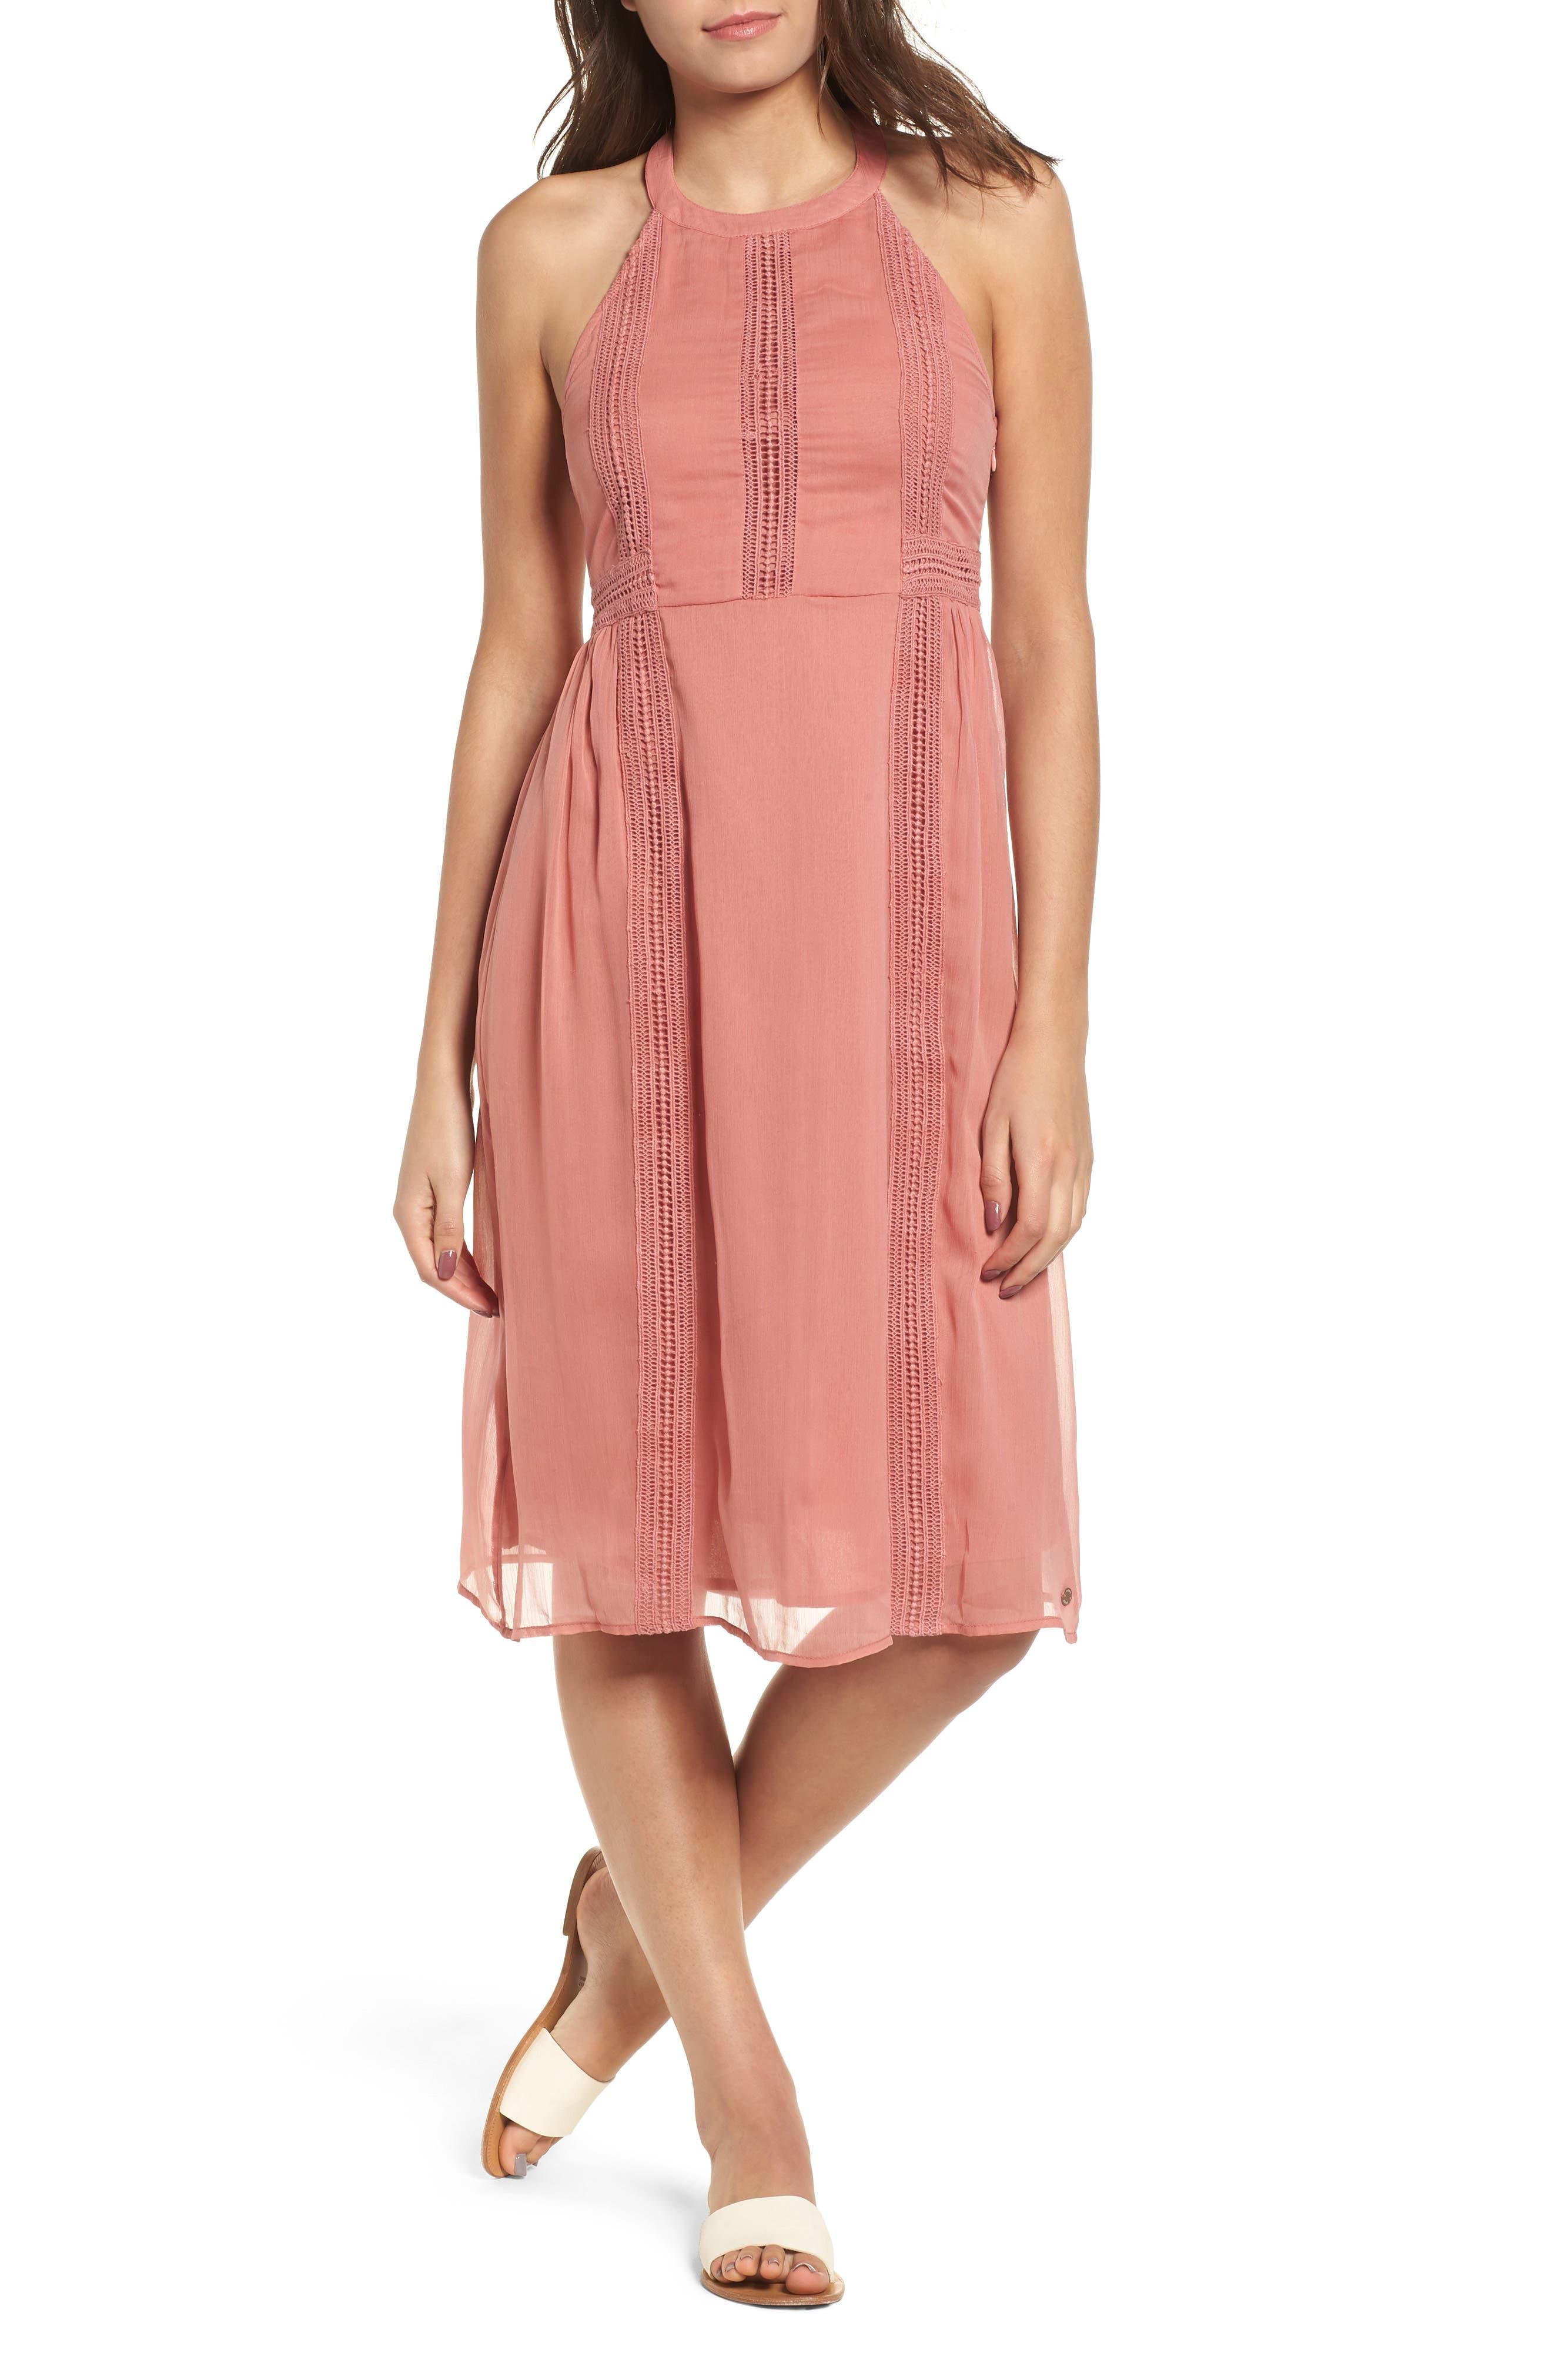 Blurred Landscape Dress,                         Main,                         color, WITHERED ROSE